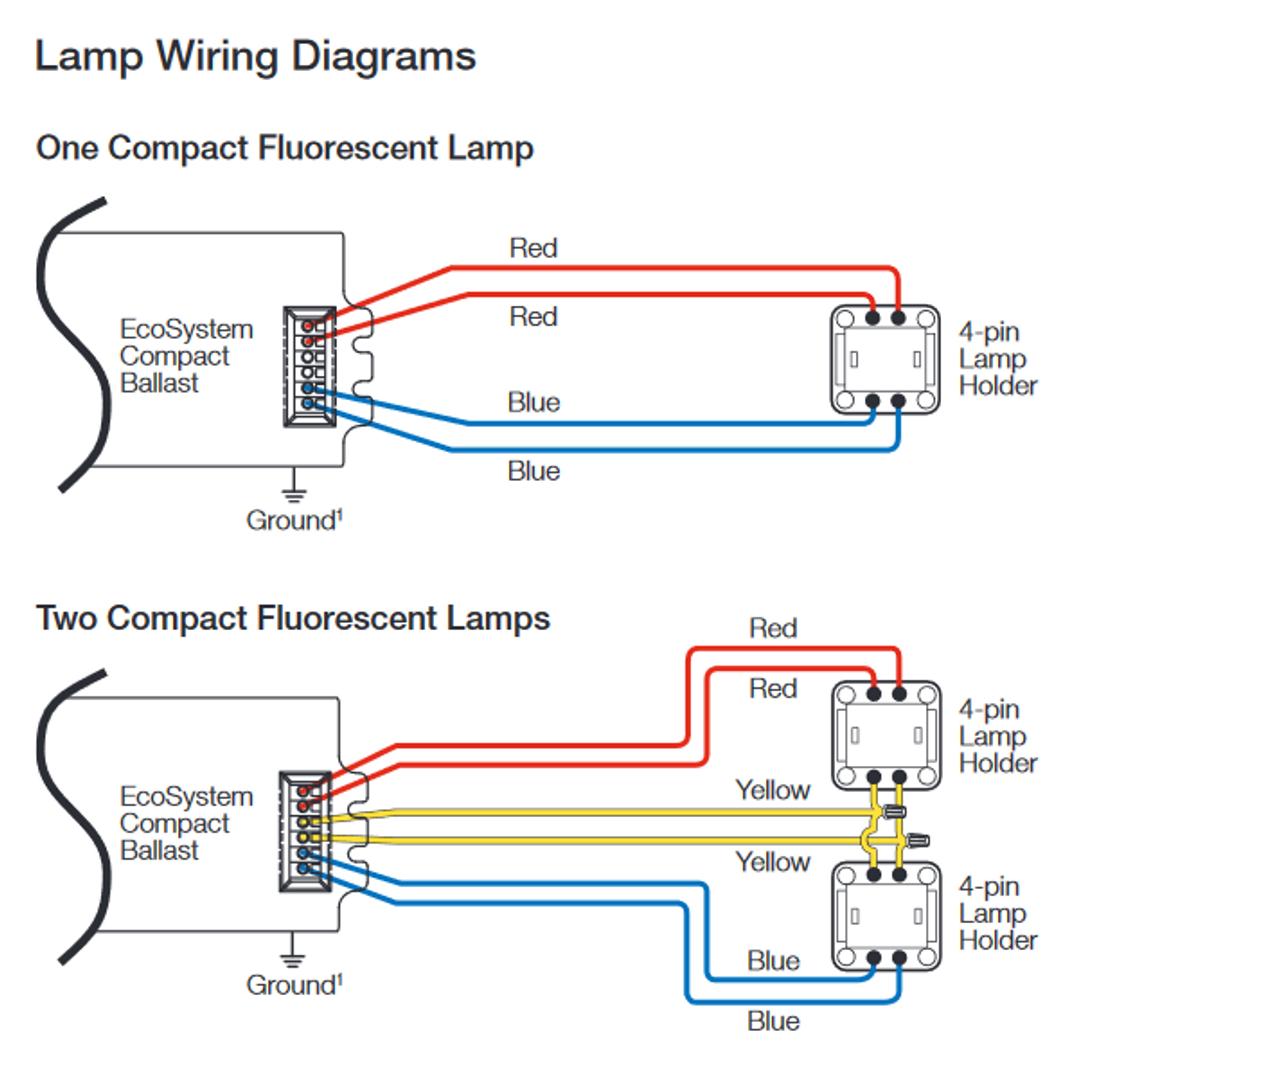 4 Pin Bulb Wiring | Wiring Diagram  Bulb Lamp Wiring Diagram on light wiring diagram, lamp socket diagram, light bulb diagram, 4ft 4 bulb fluorescent fixture wiring diagram, h4 halogen headlight wiring diagram, hid kit wiring diagram, fluorescent fixtures t5 circuit diagram, ballast wiring diagram, lamp parts diagram, 6 bulb lamp wiring diagram, 2 bulb lamp wiring diagram, number pin connector wiring diagram, 3 bulb t12 ballast diagram, 3 way bulb diagram, incandescent bulb diagram, hid headlight conversion wiring diagram, led light parts diagram,